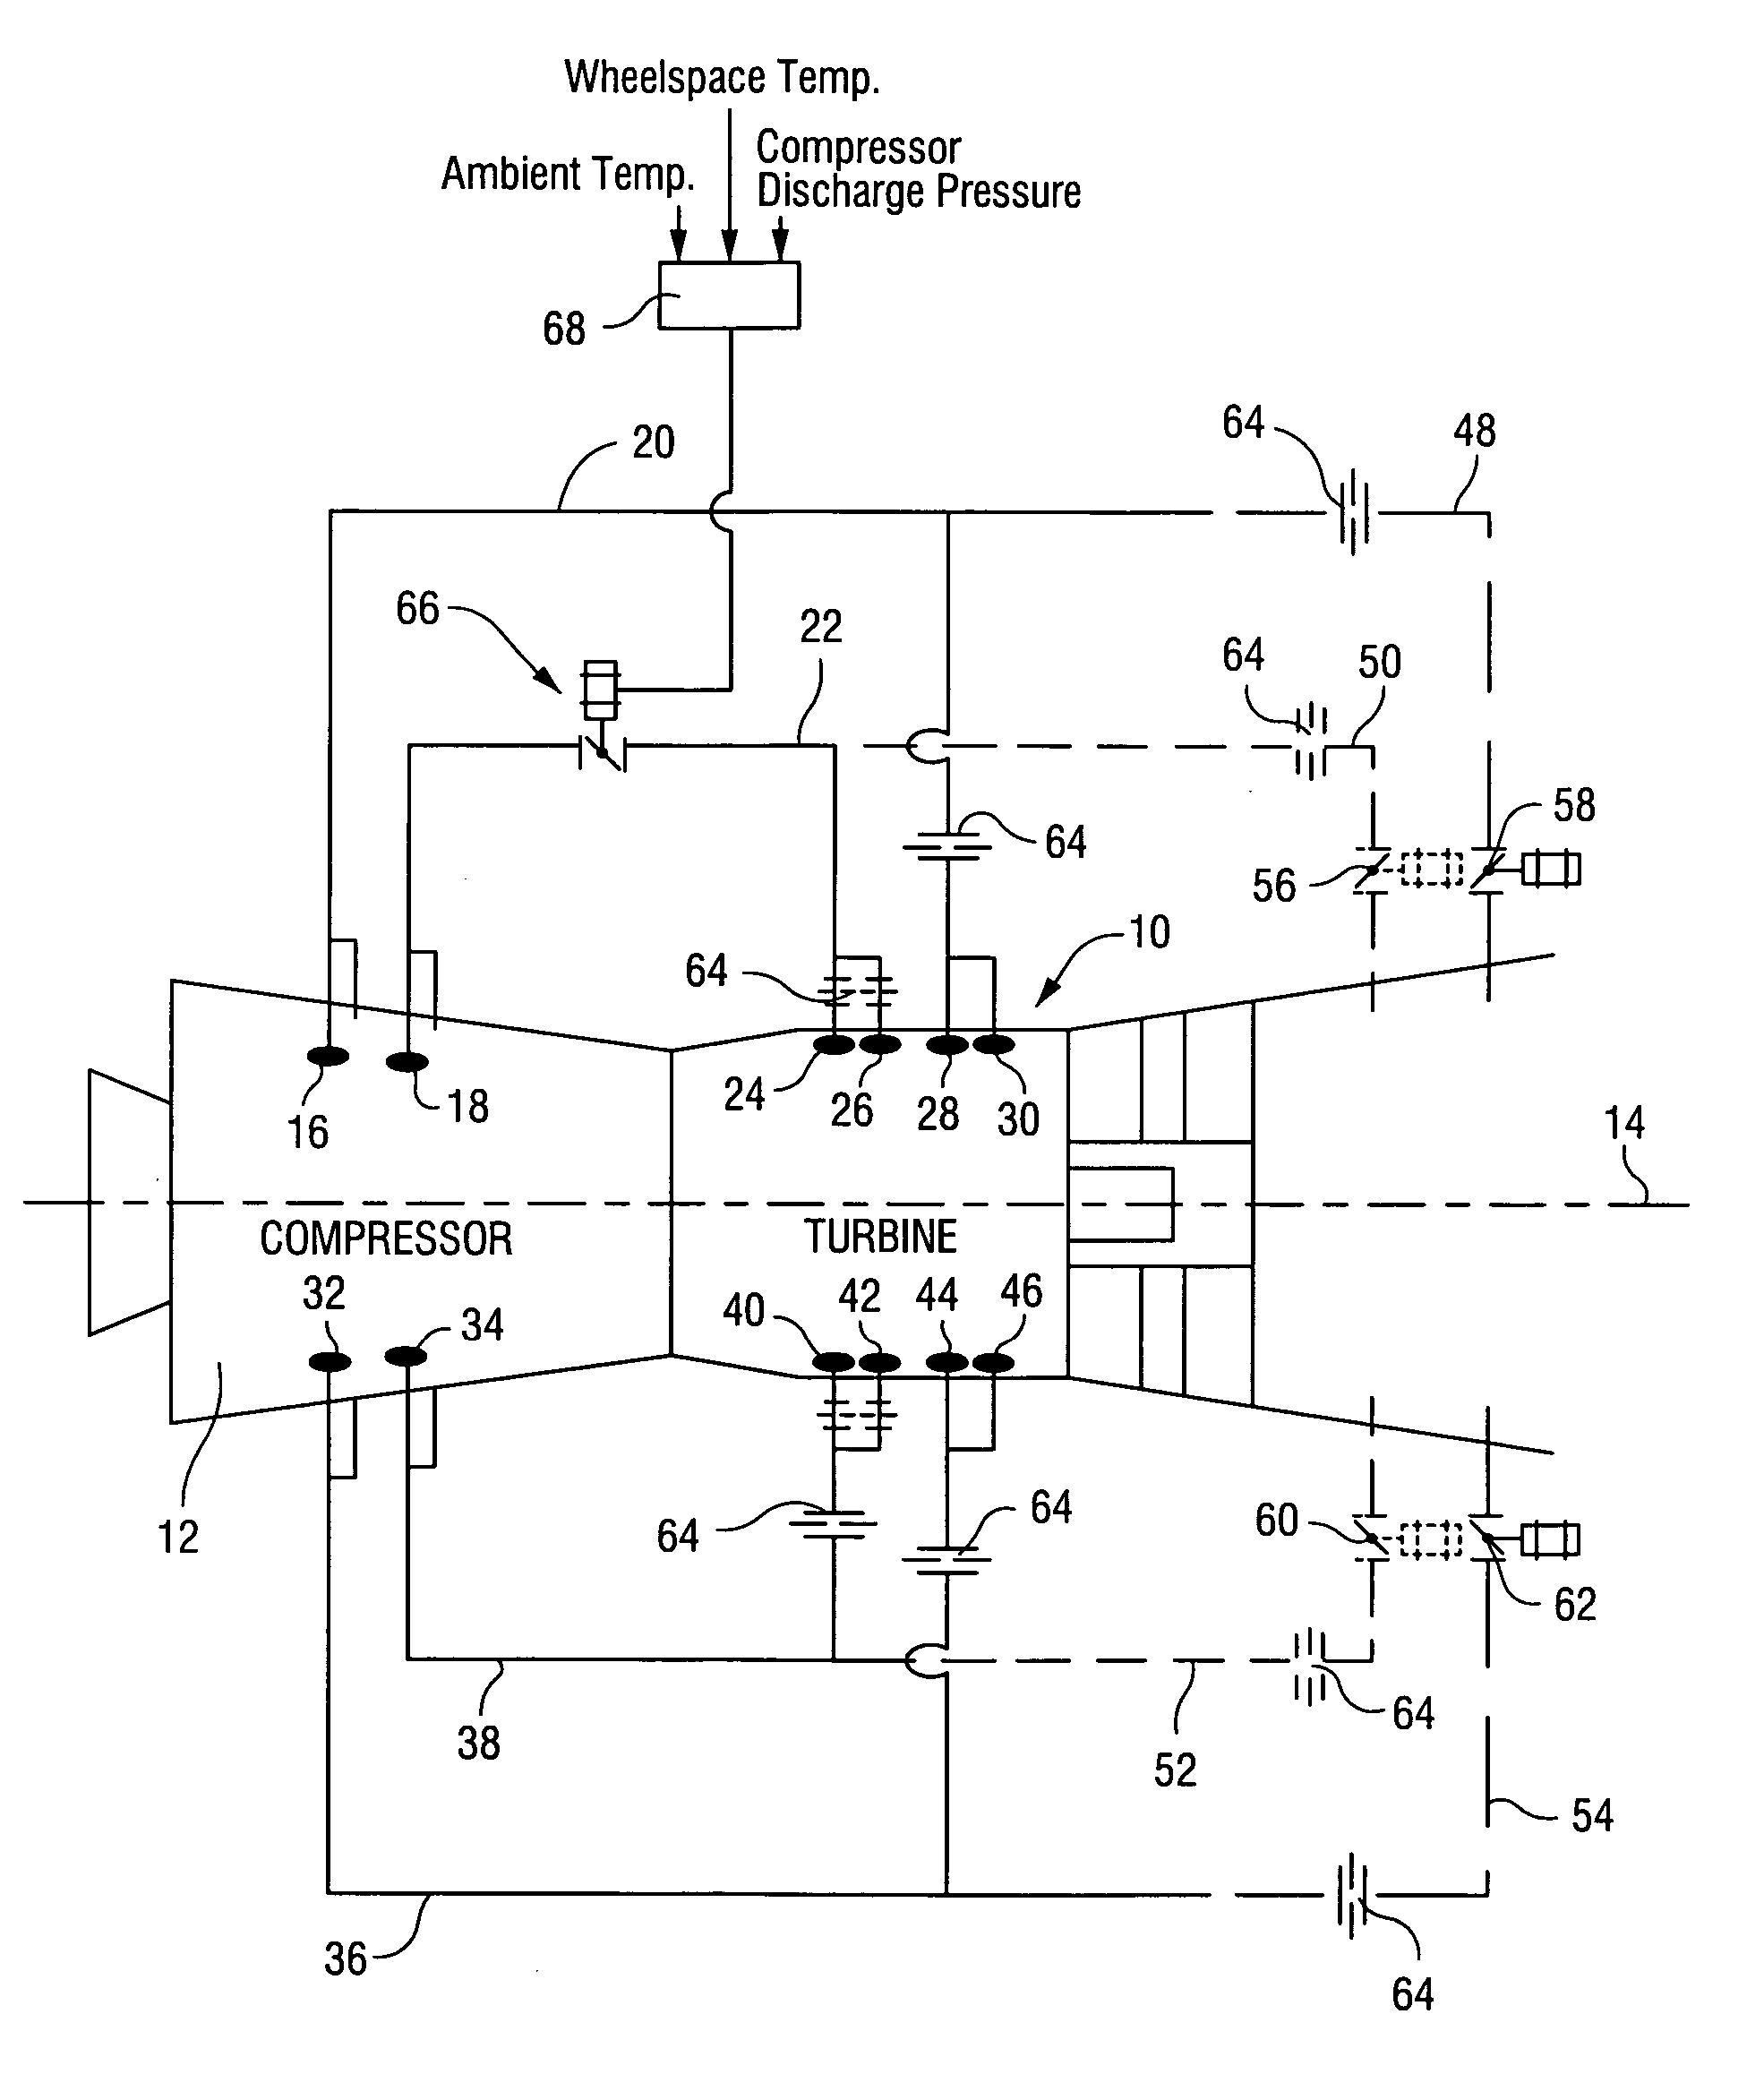 Patente US Turbine wheelspace temperature control